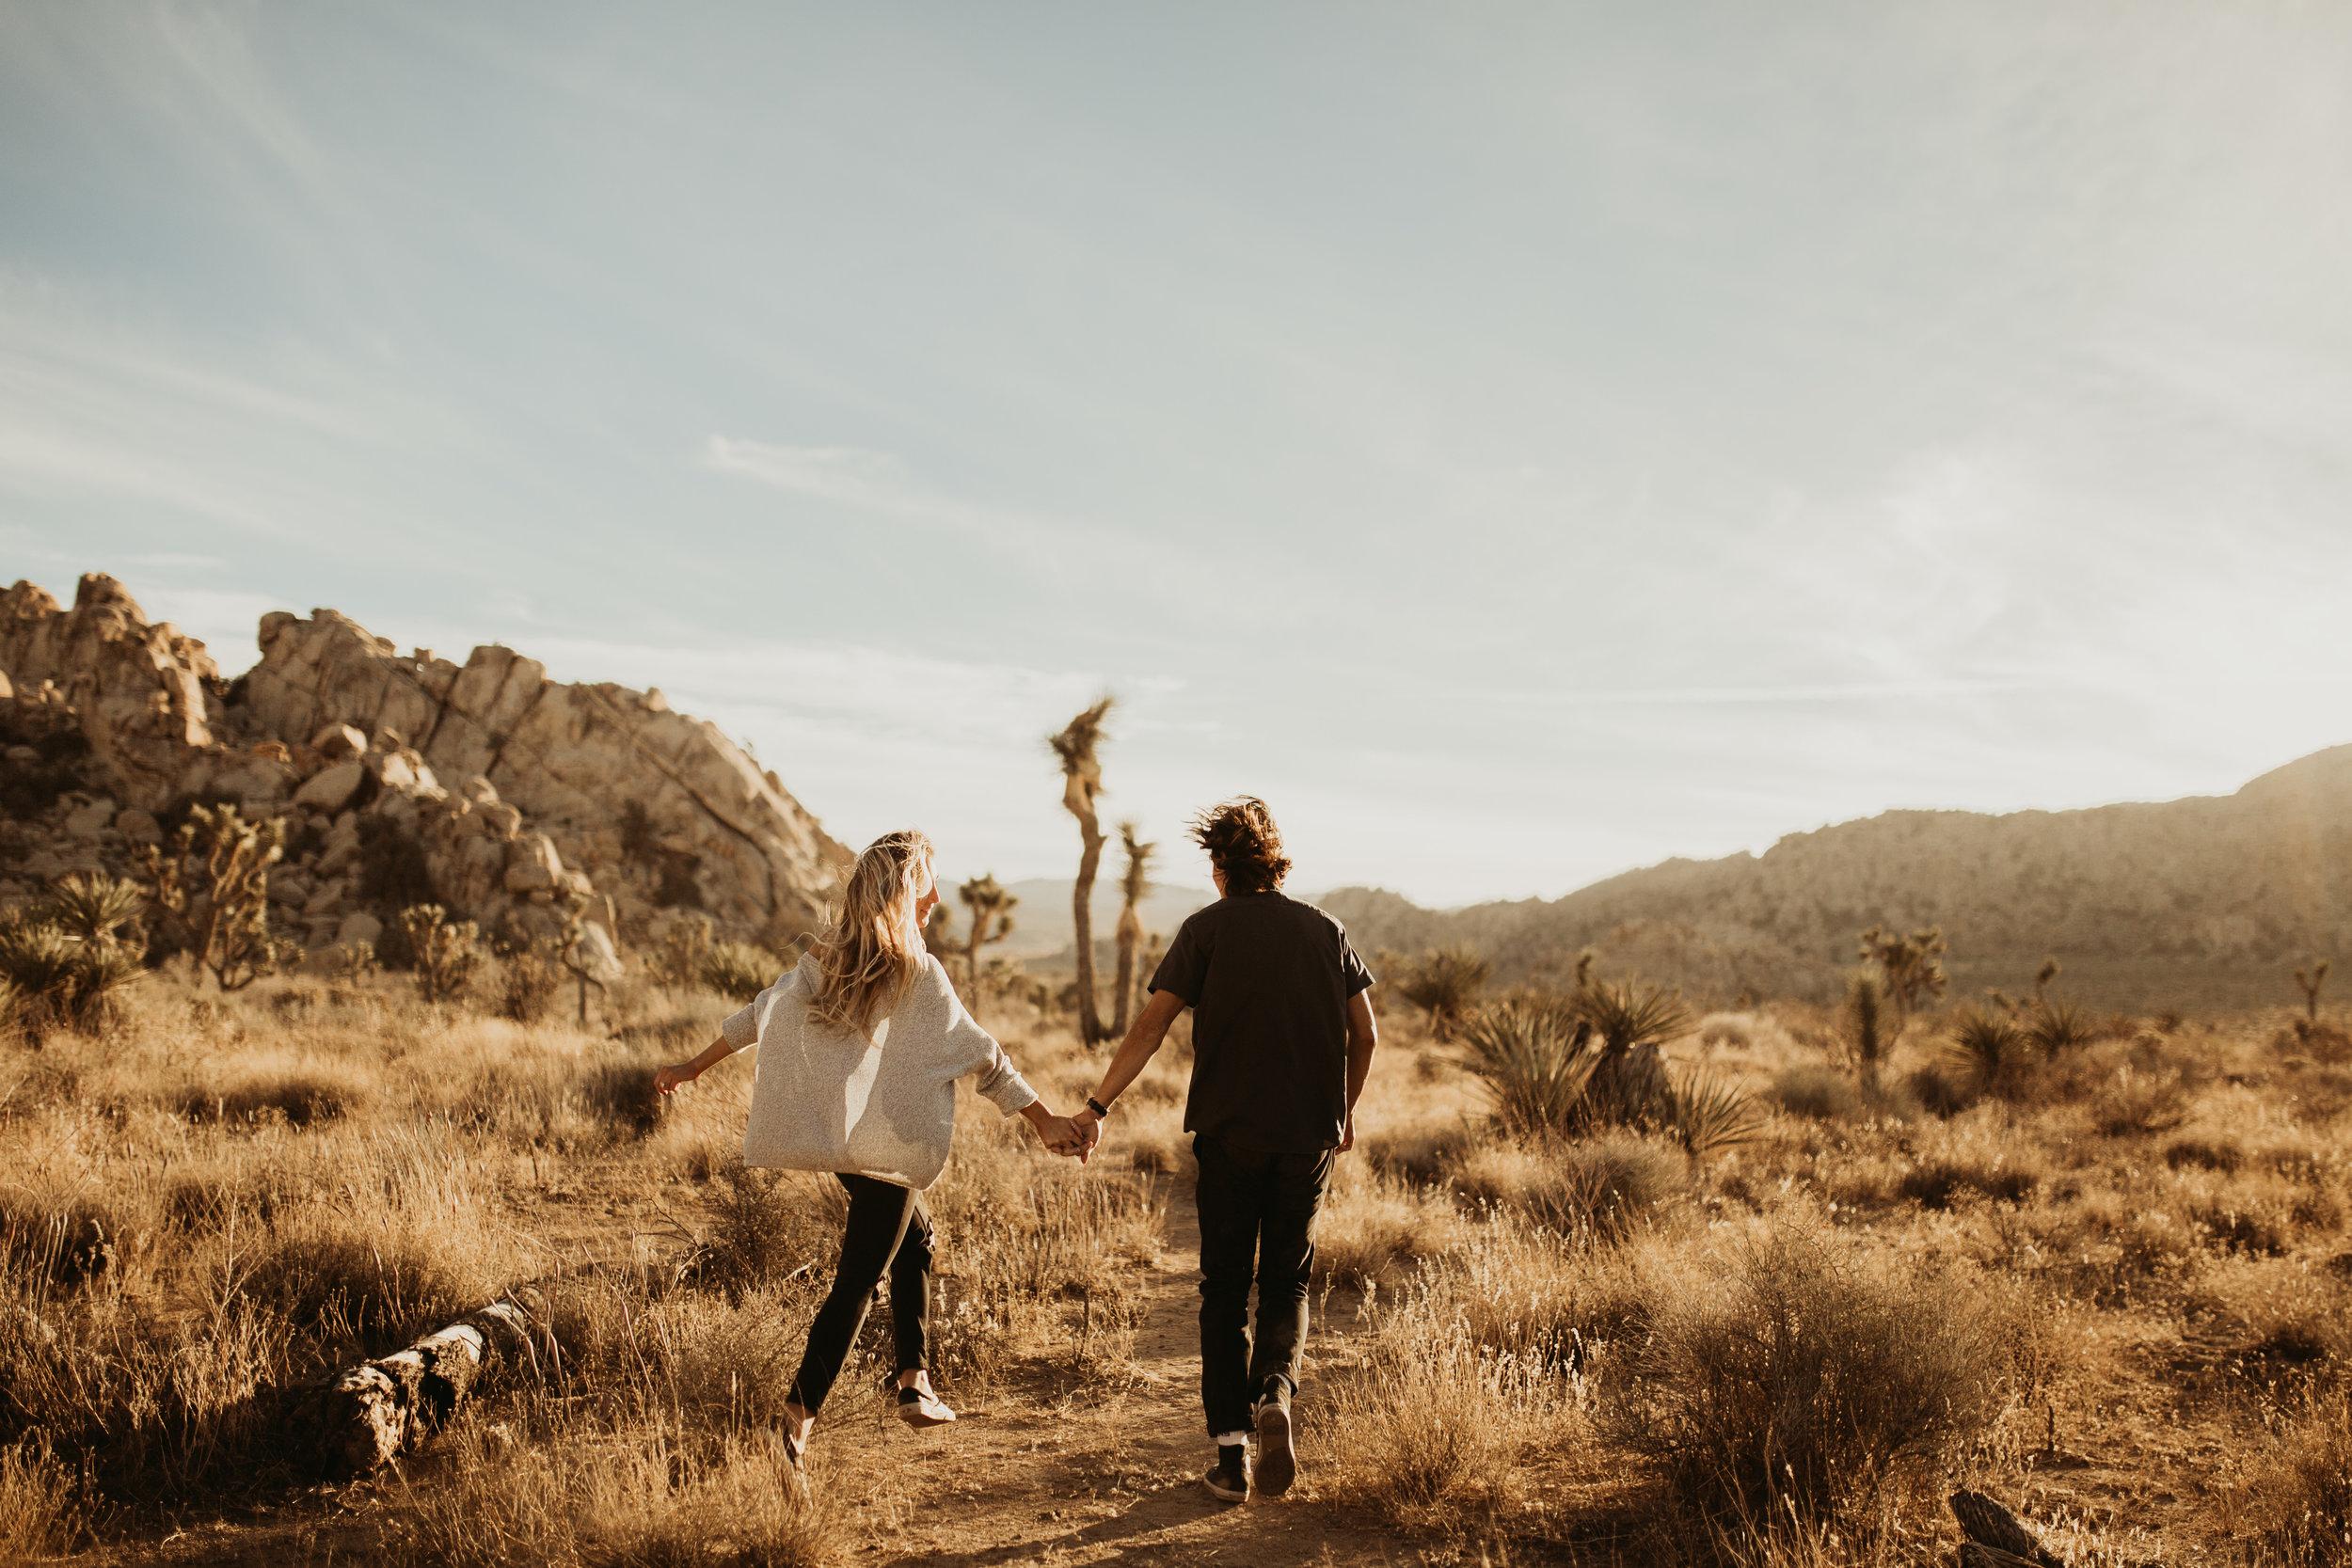 joshuatree+california+arizona+wedding+elopement+photographer23.jpg